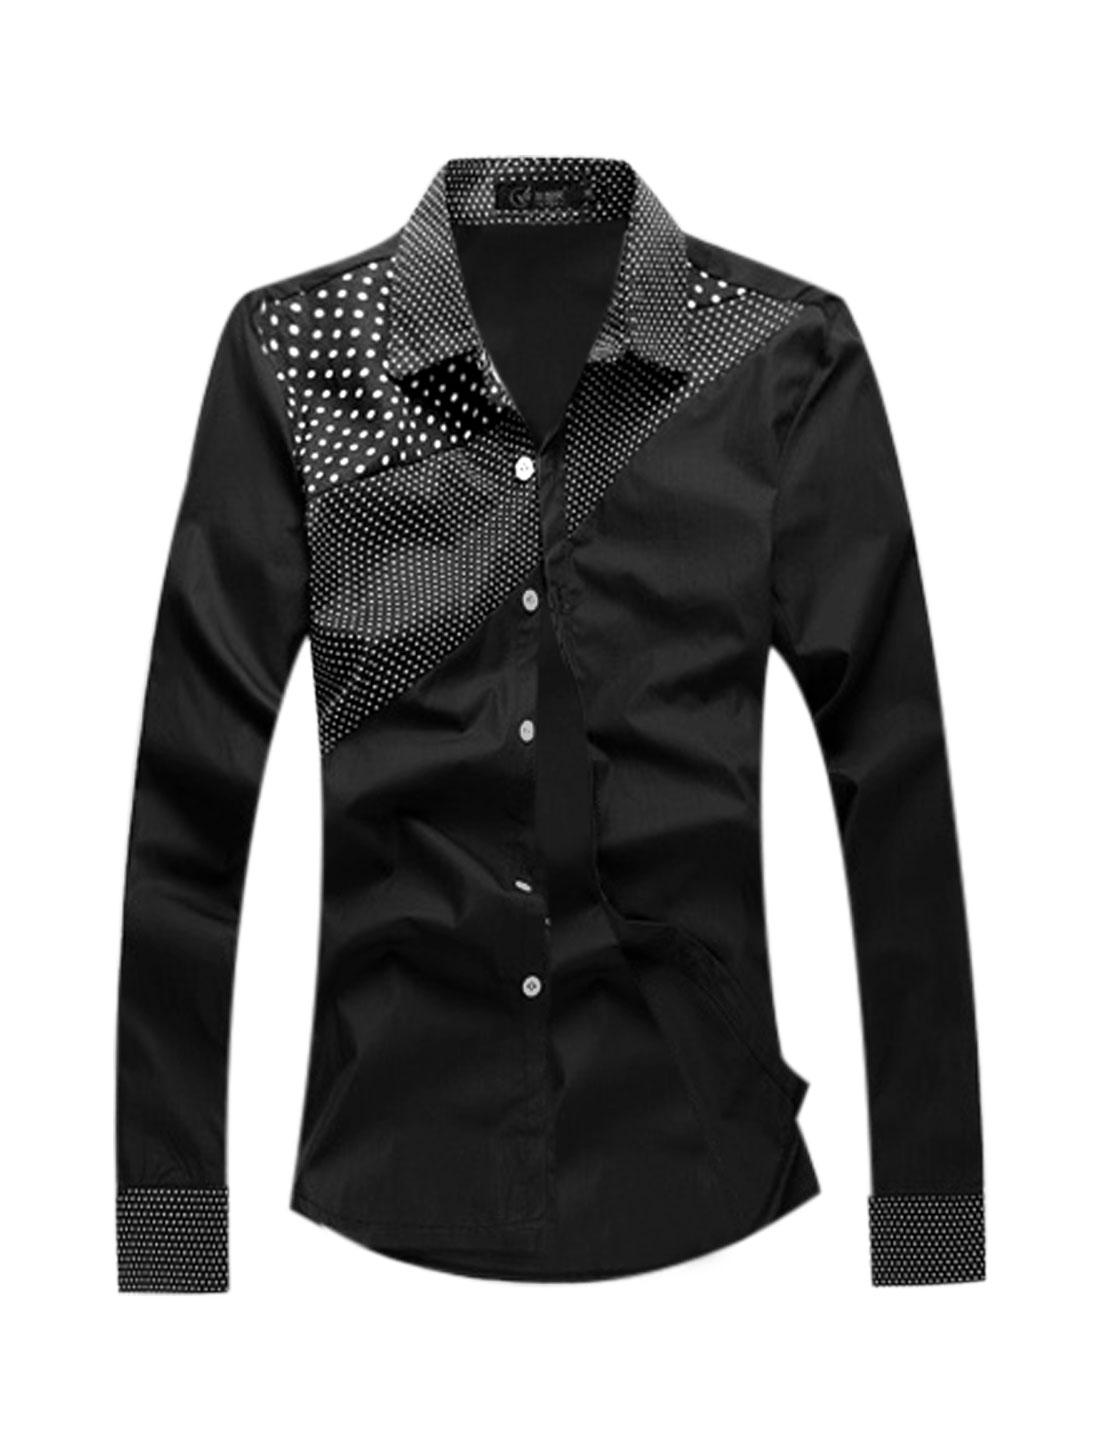 Man Dots Prints Point Collar Long Sleeves Button Closure Shirt Black M